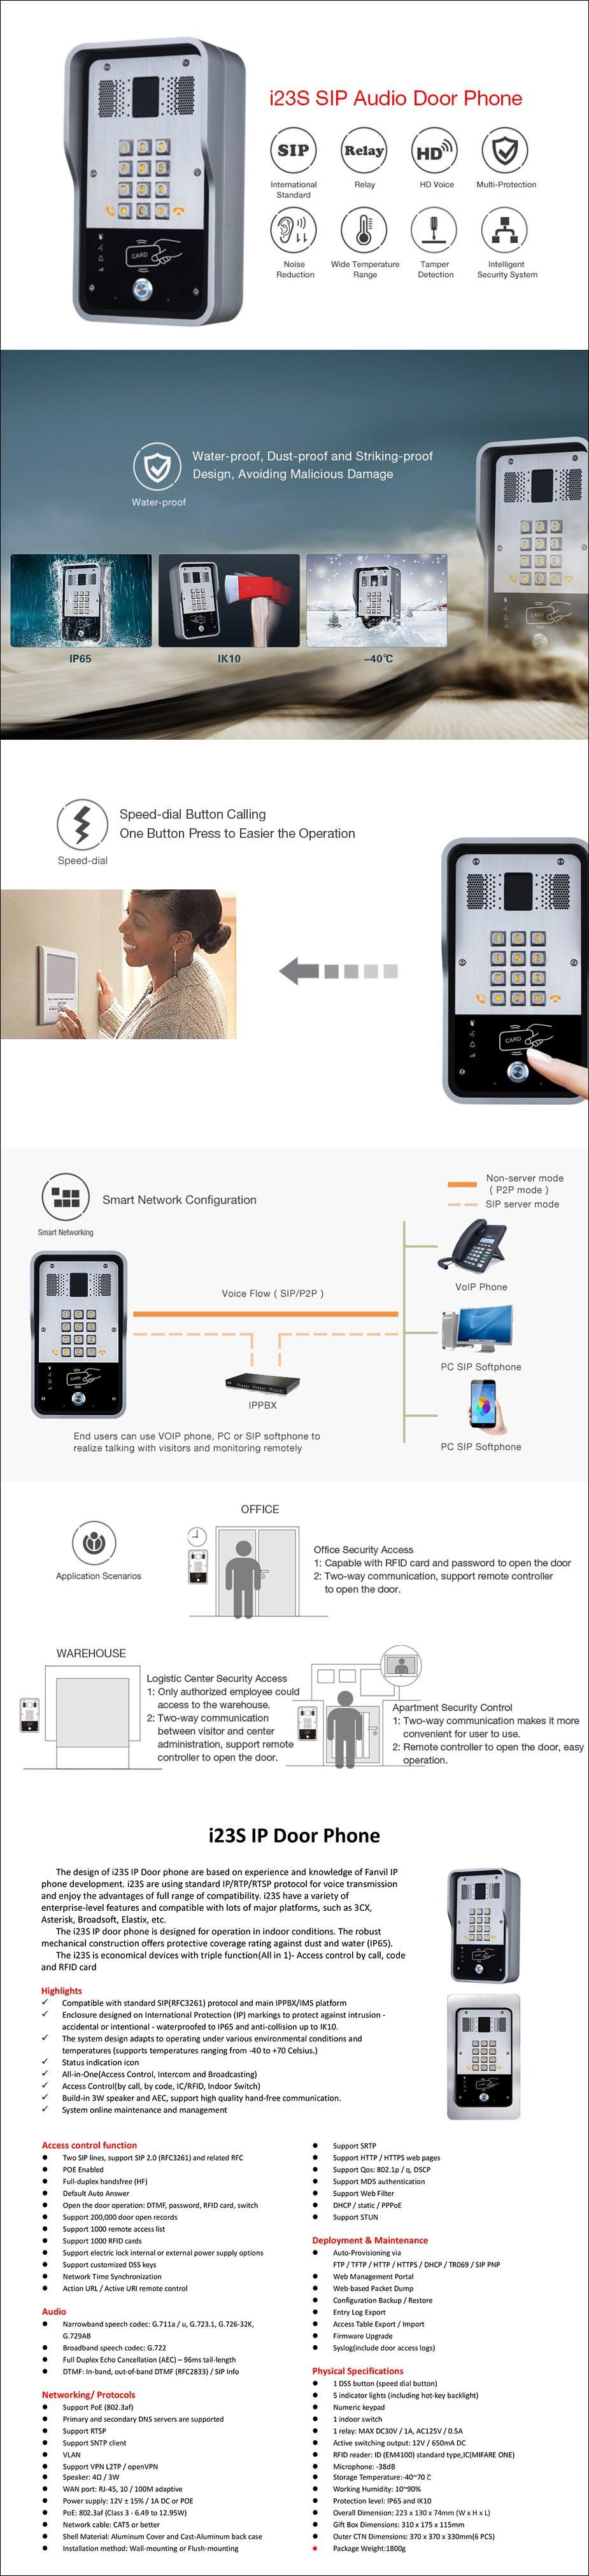 Fanvil i23S 2-Line HD Audio Intercom System - Keypad - Desktop Overview 1